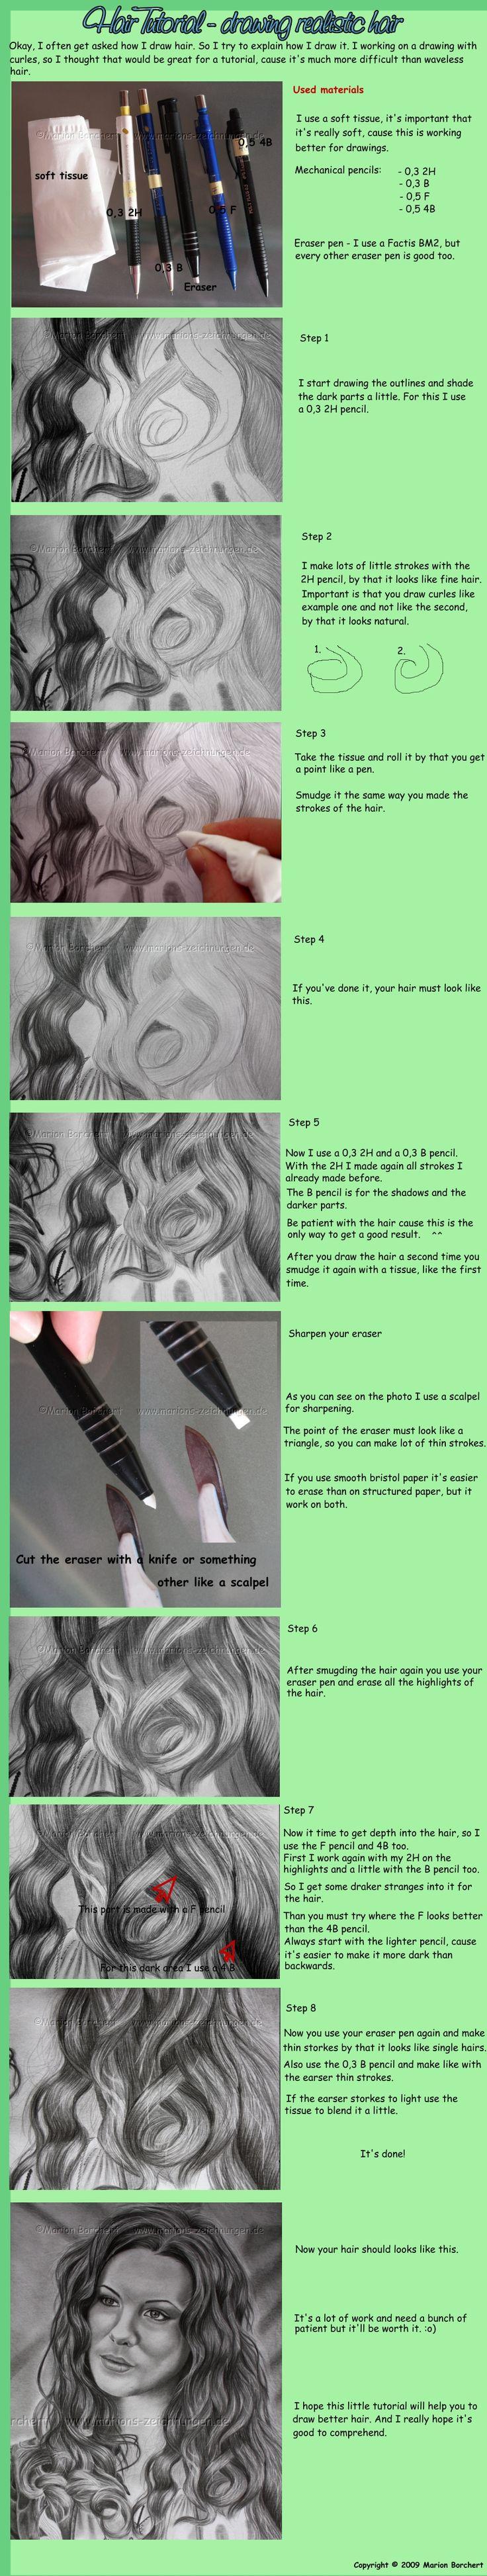 Drawing realistic hair.